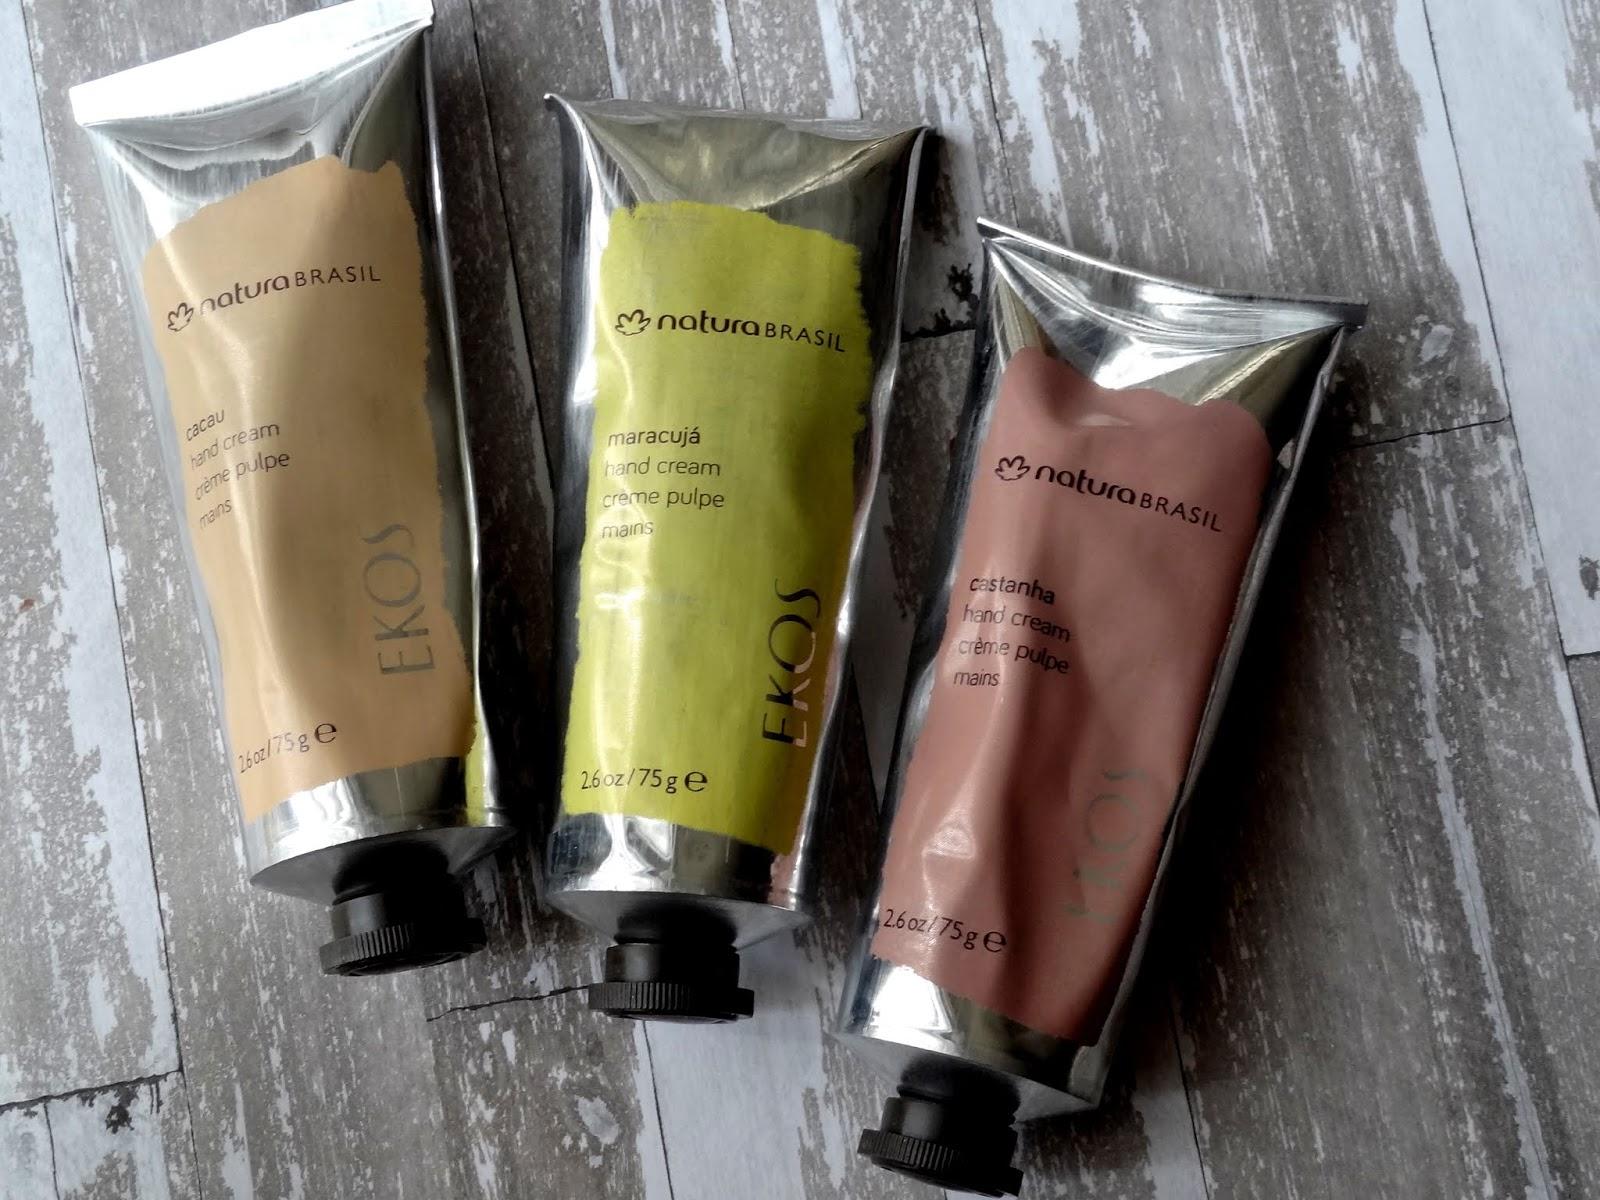 Makeup, Beauty and More: NaturaBrasil Bath, Body And Home ...